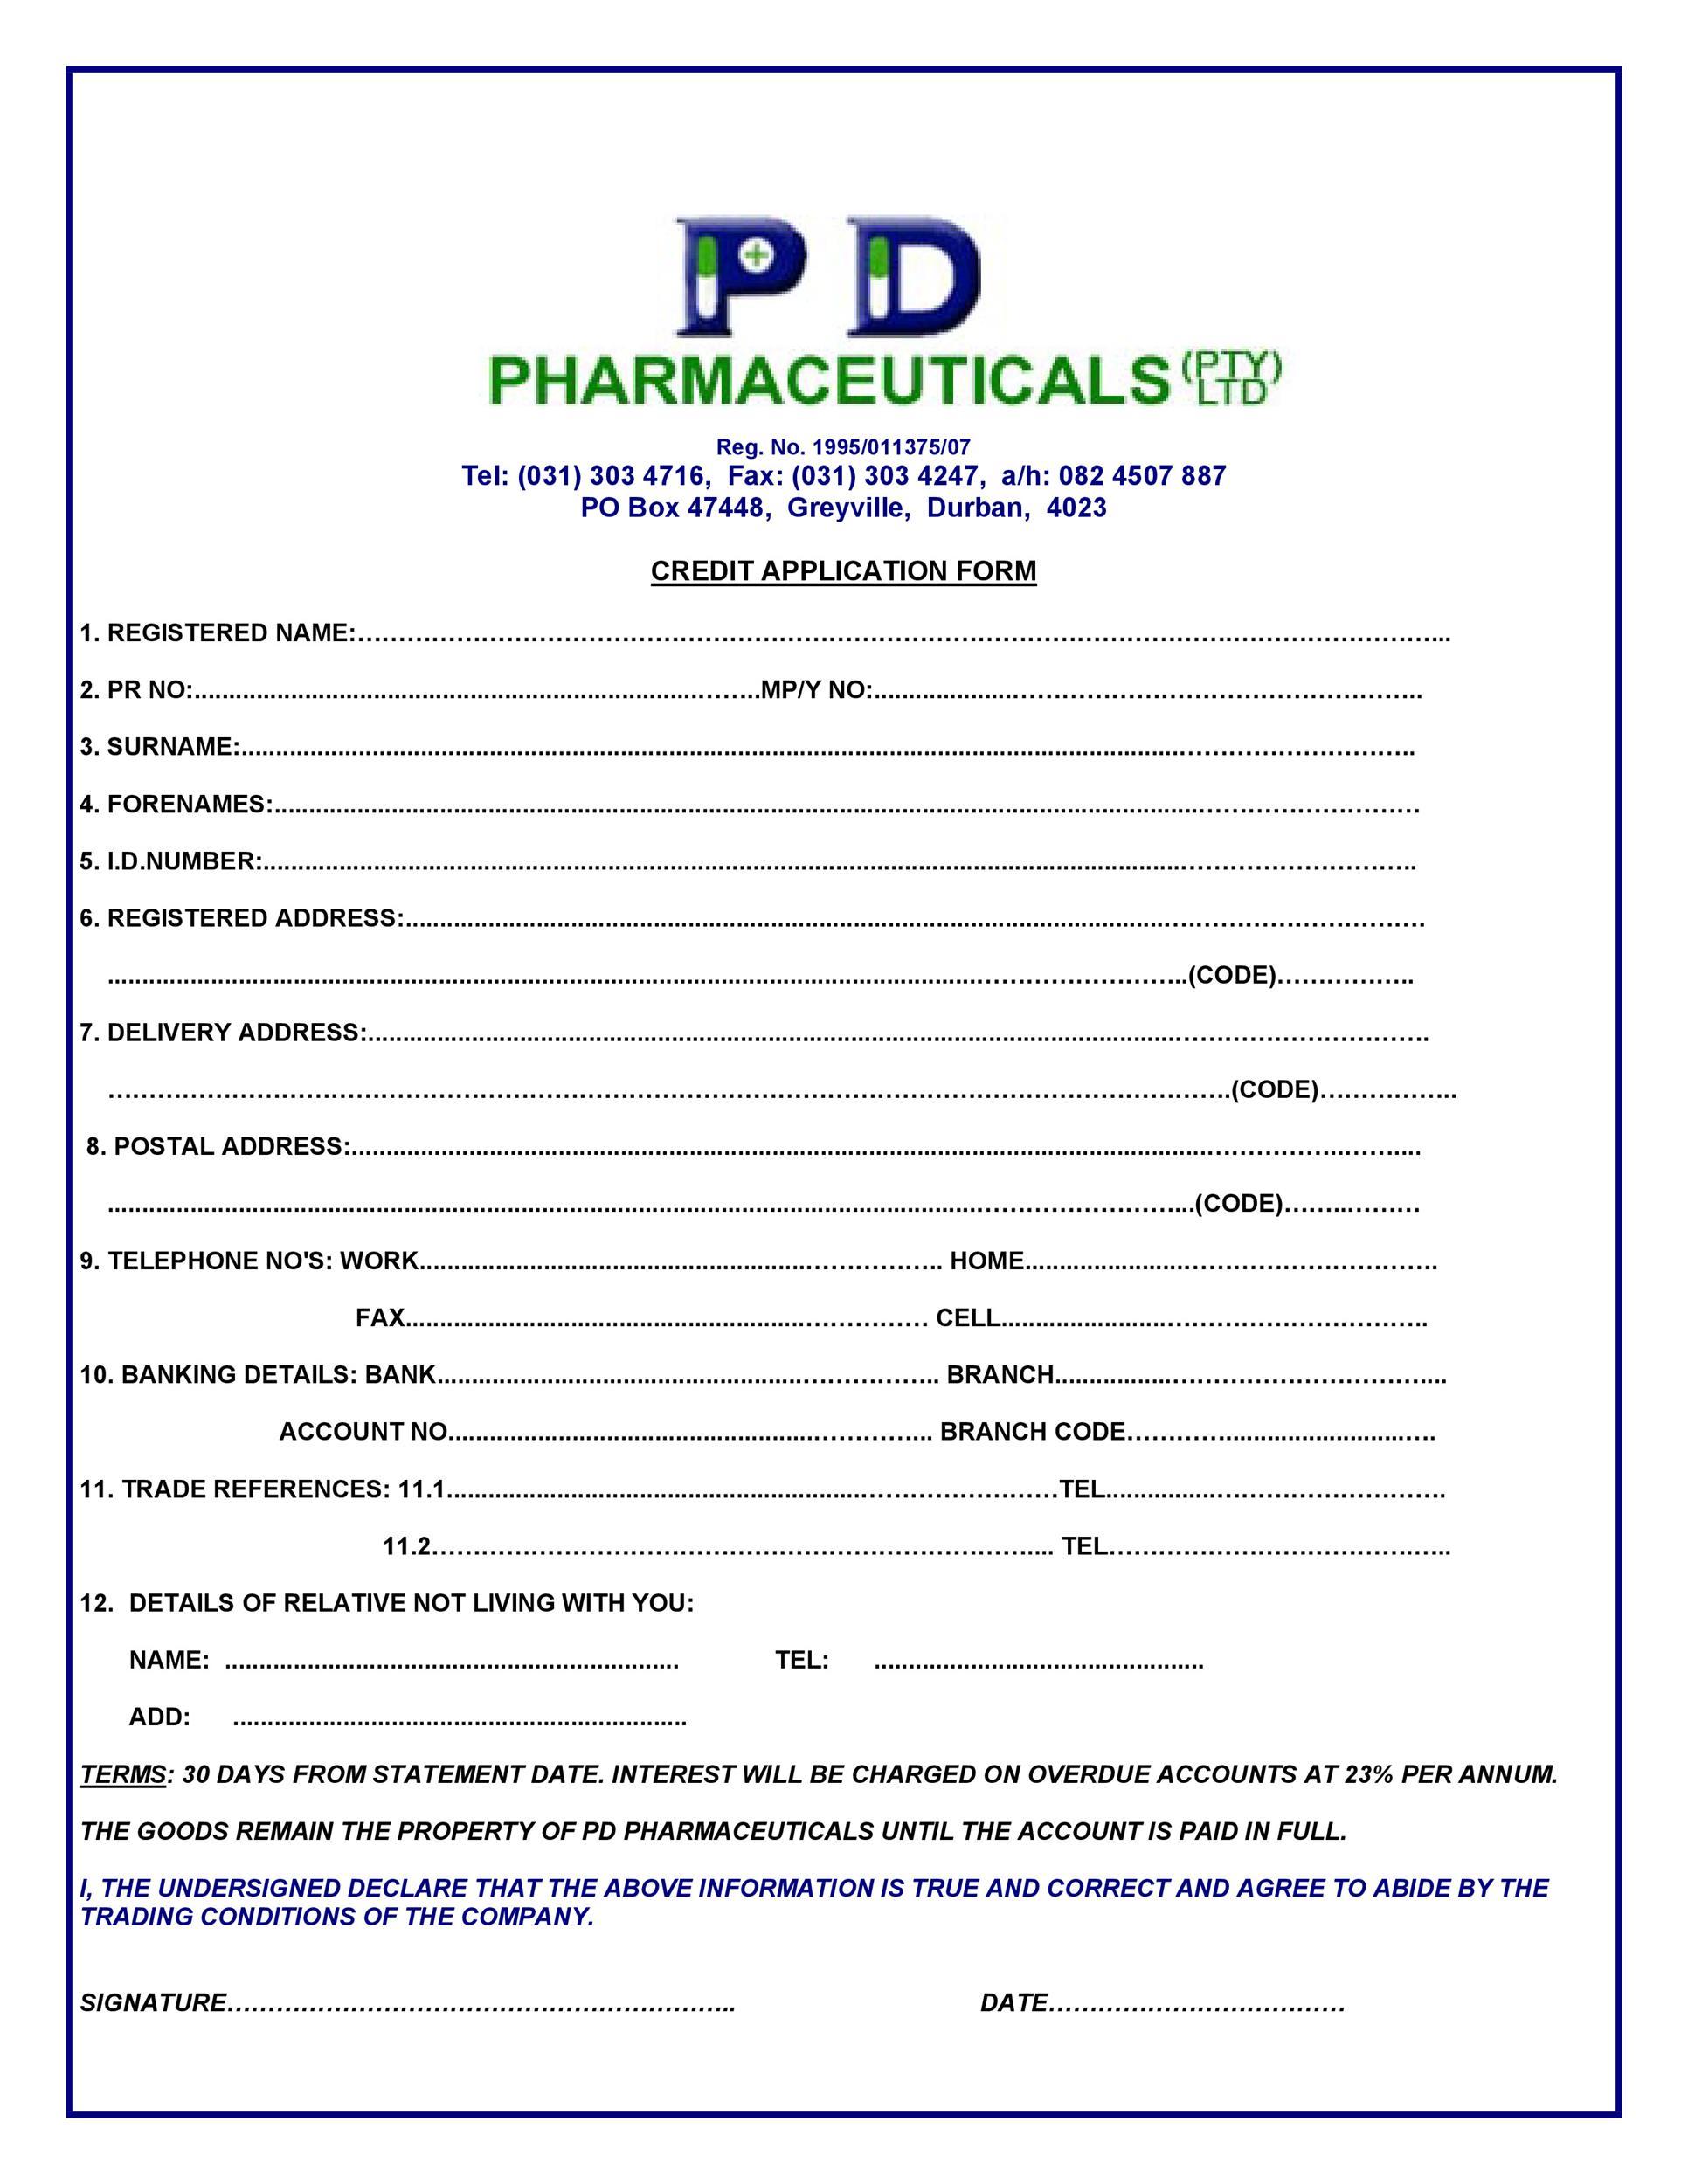 Free Credit Application Form 31